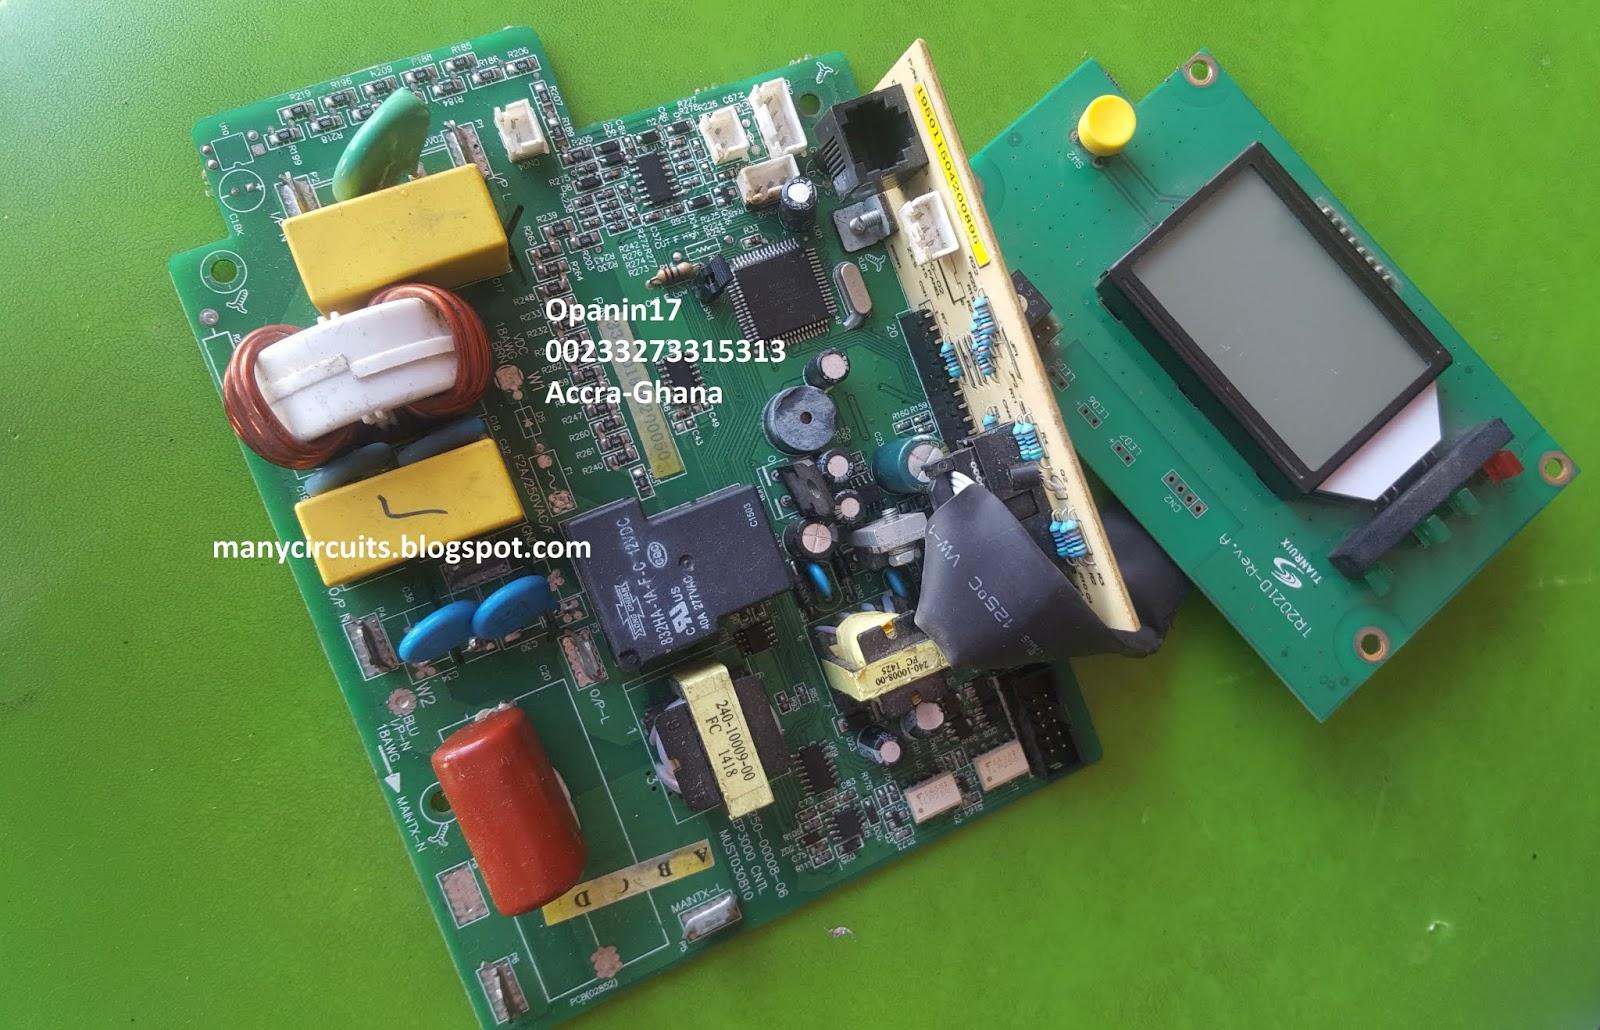 MUST, POWER STAR, FELICITY INVERTER REPAIRS   Many circuits